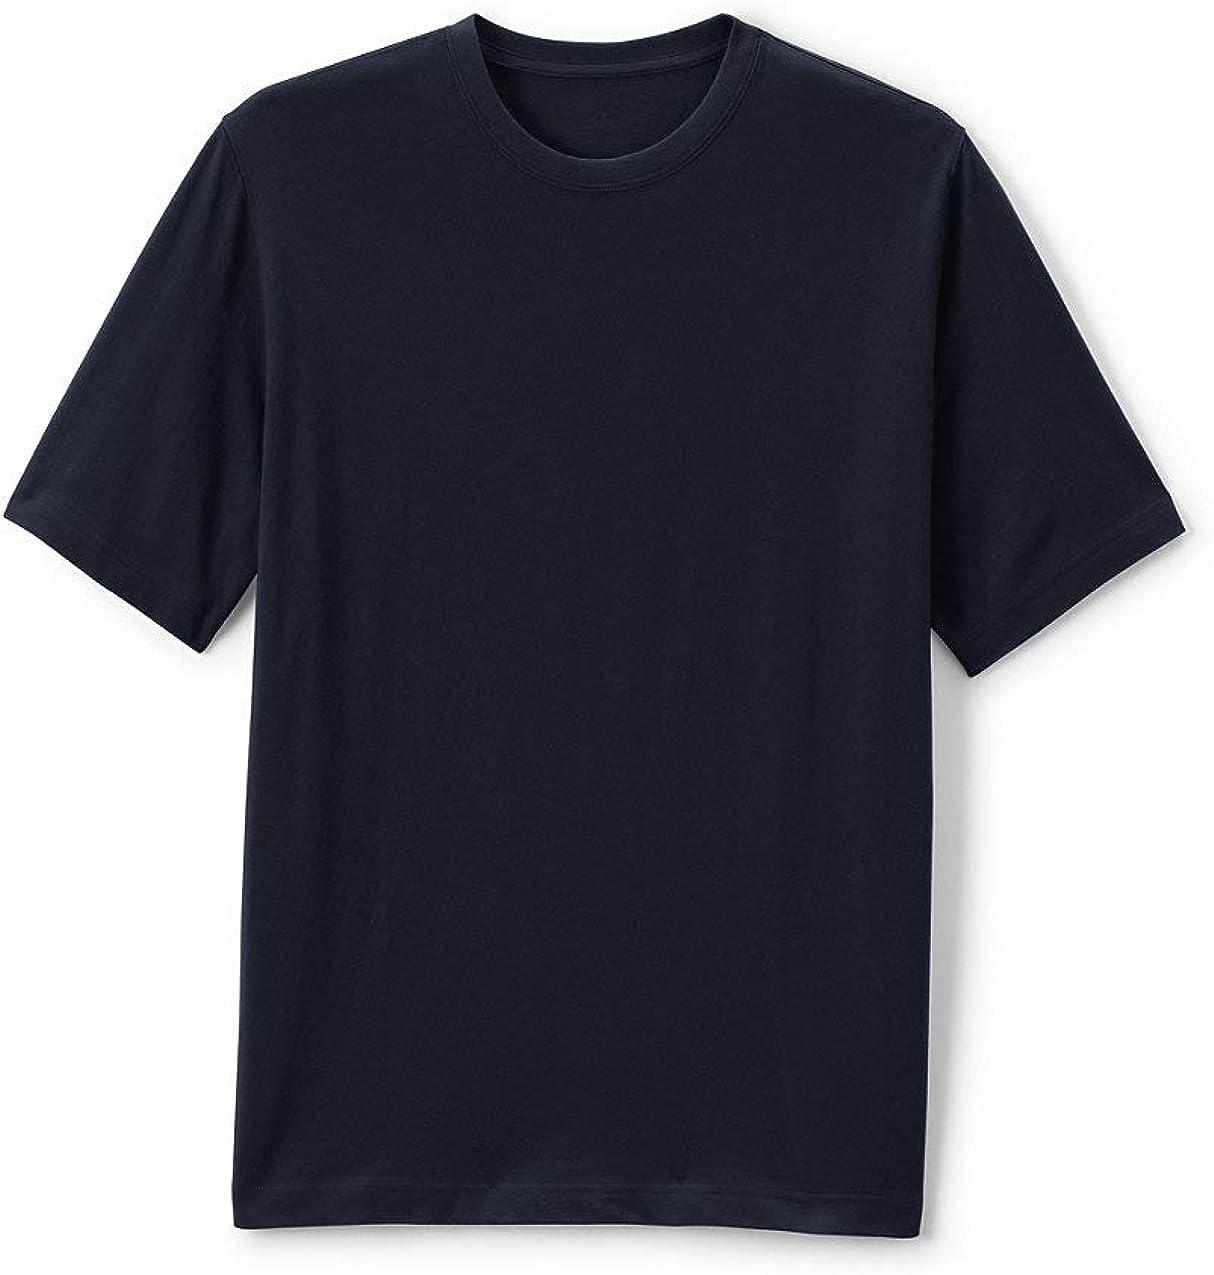 Lands' End School Uniform Men's Short Sleeve Essential T-Shirt